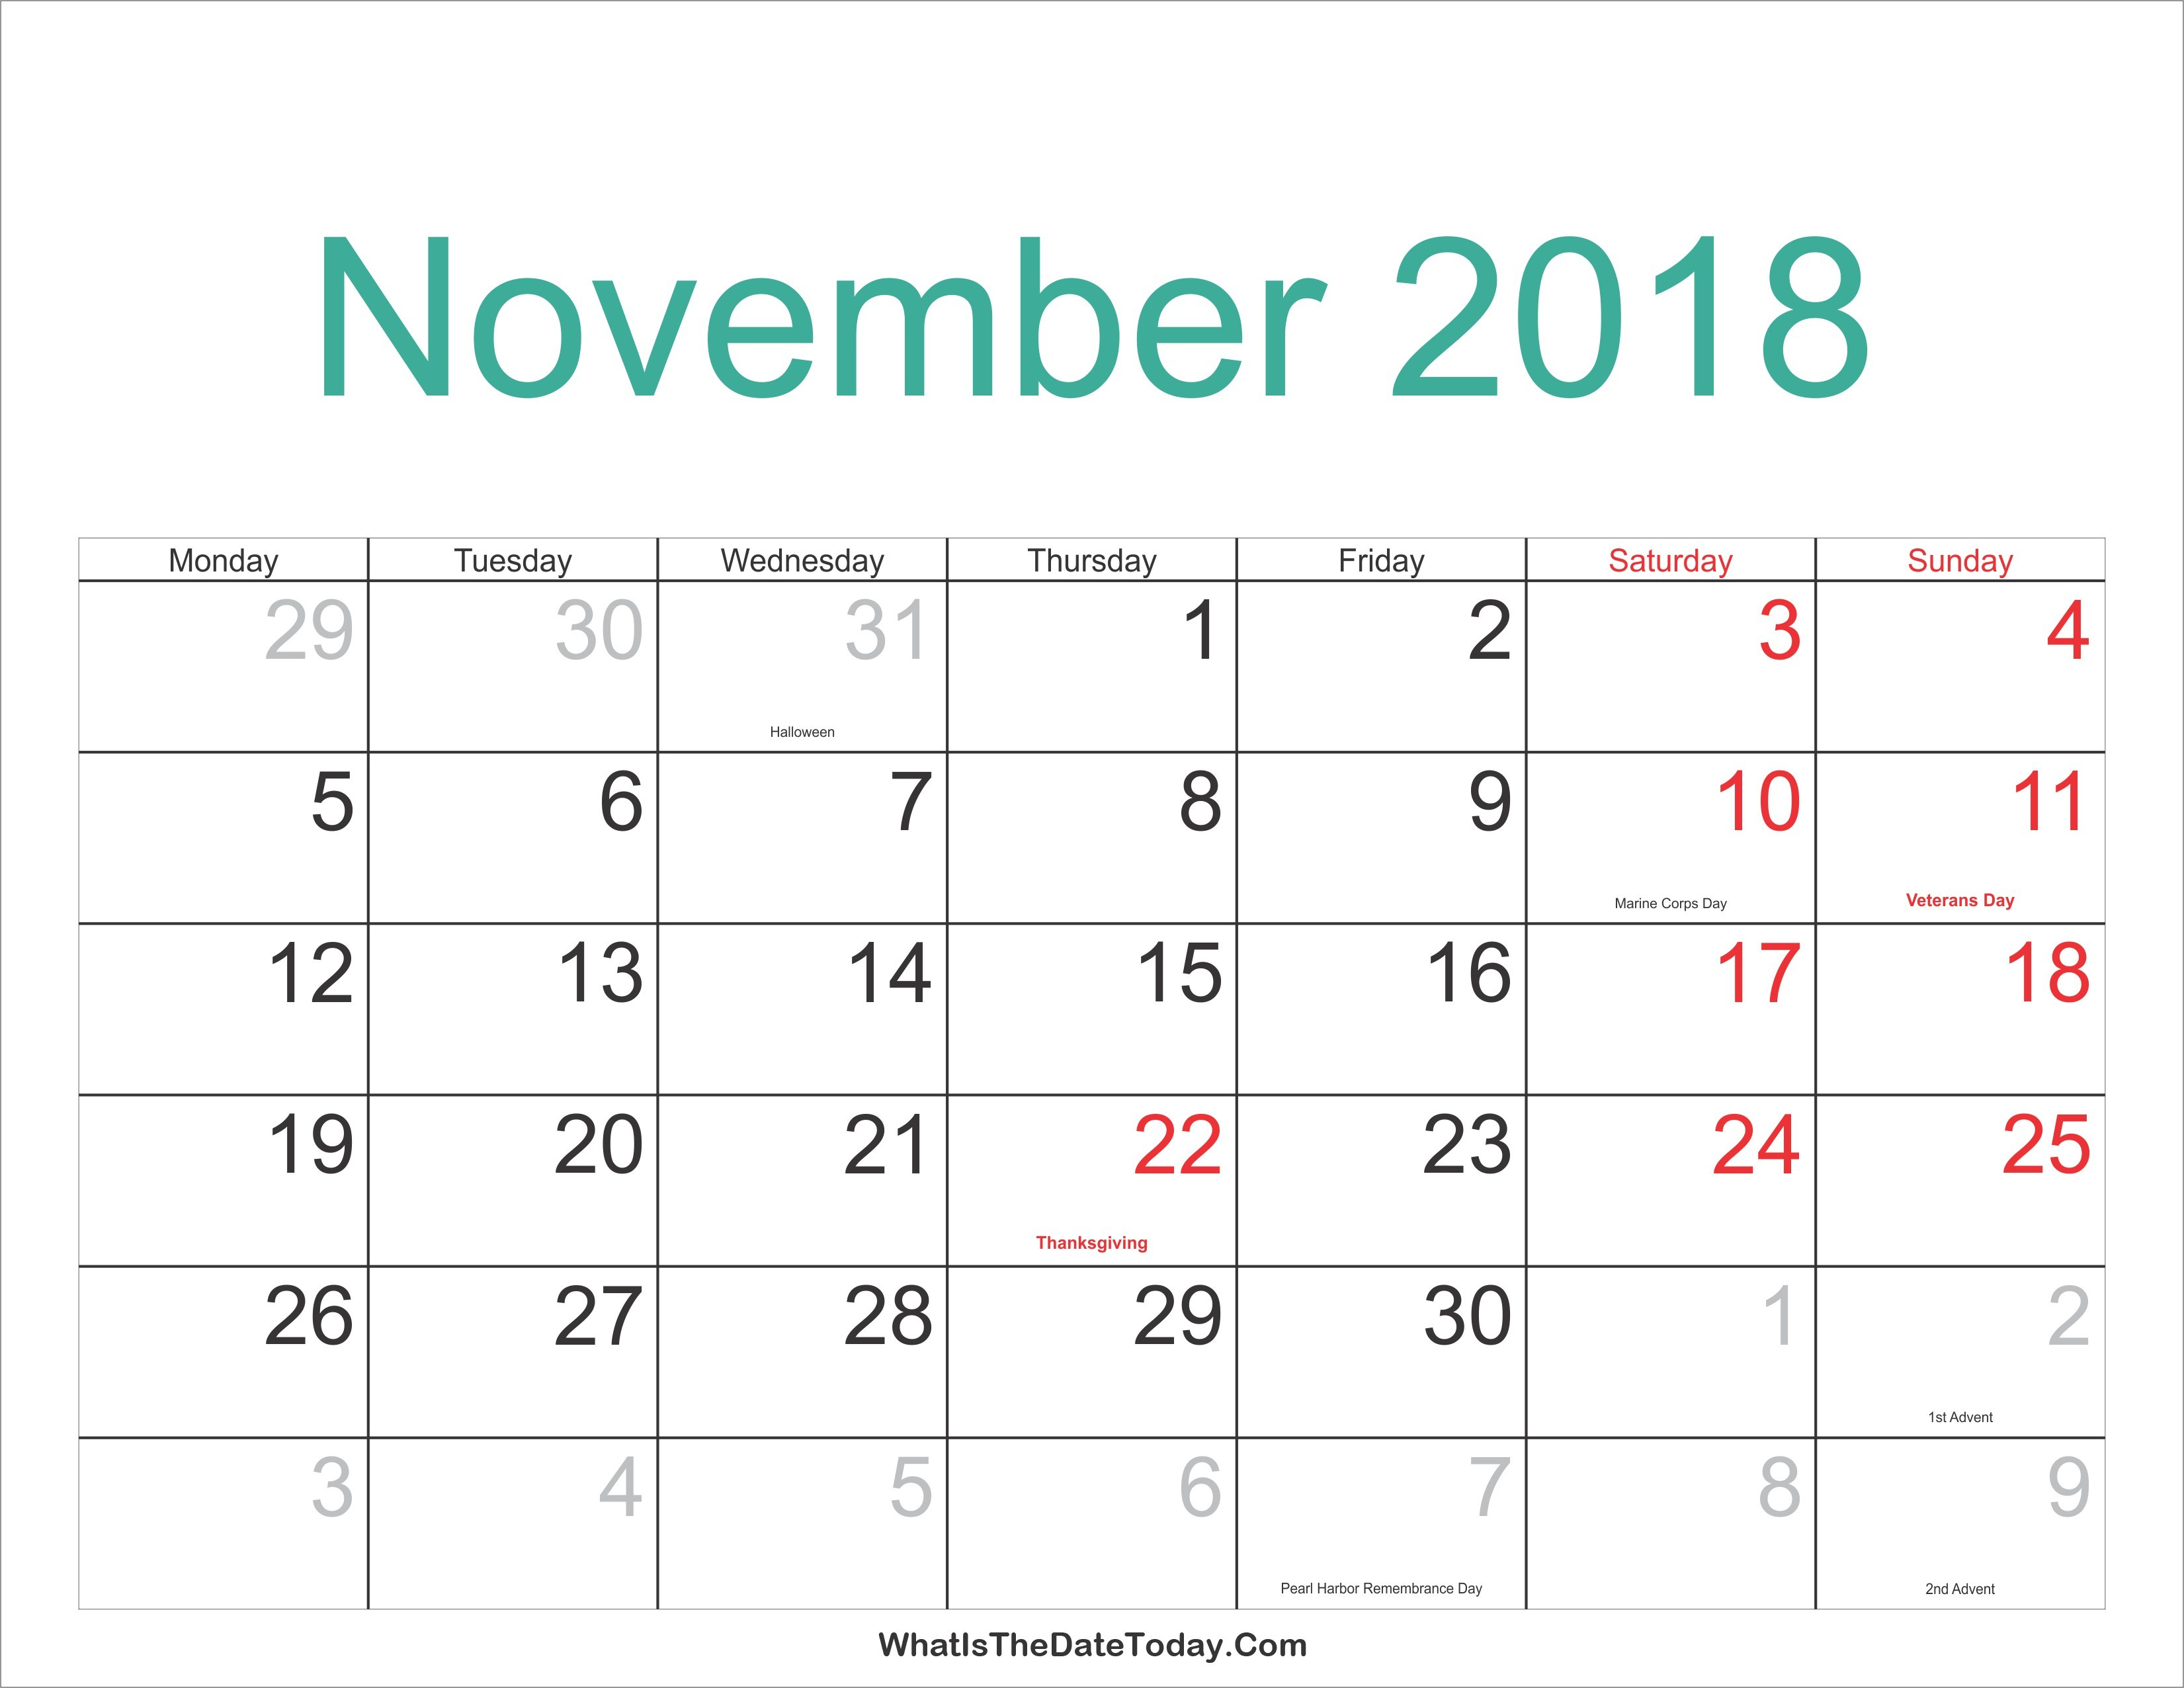 Kalender December 2019 Pdf Más Recientes November 2018 Calendar with Holidays India Usa Canada Nz Malaysia